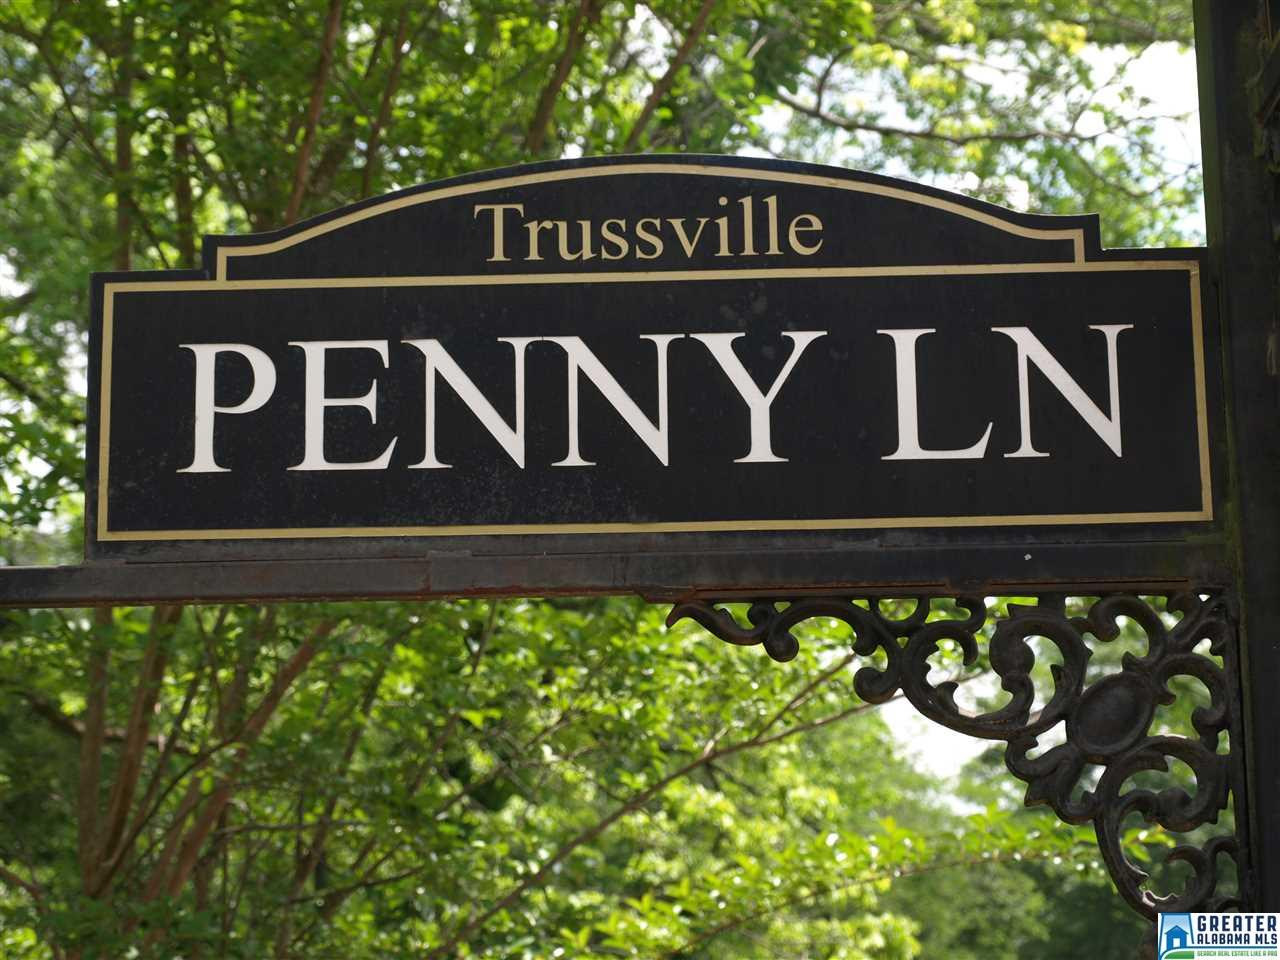 522 Penny Ln #APT 522, Trussville AL 35173